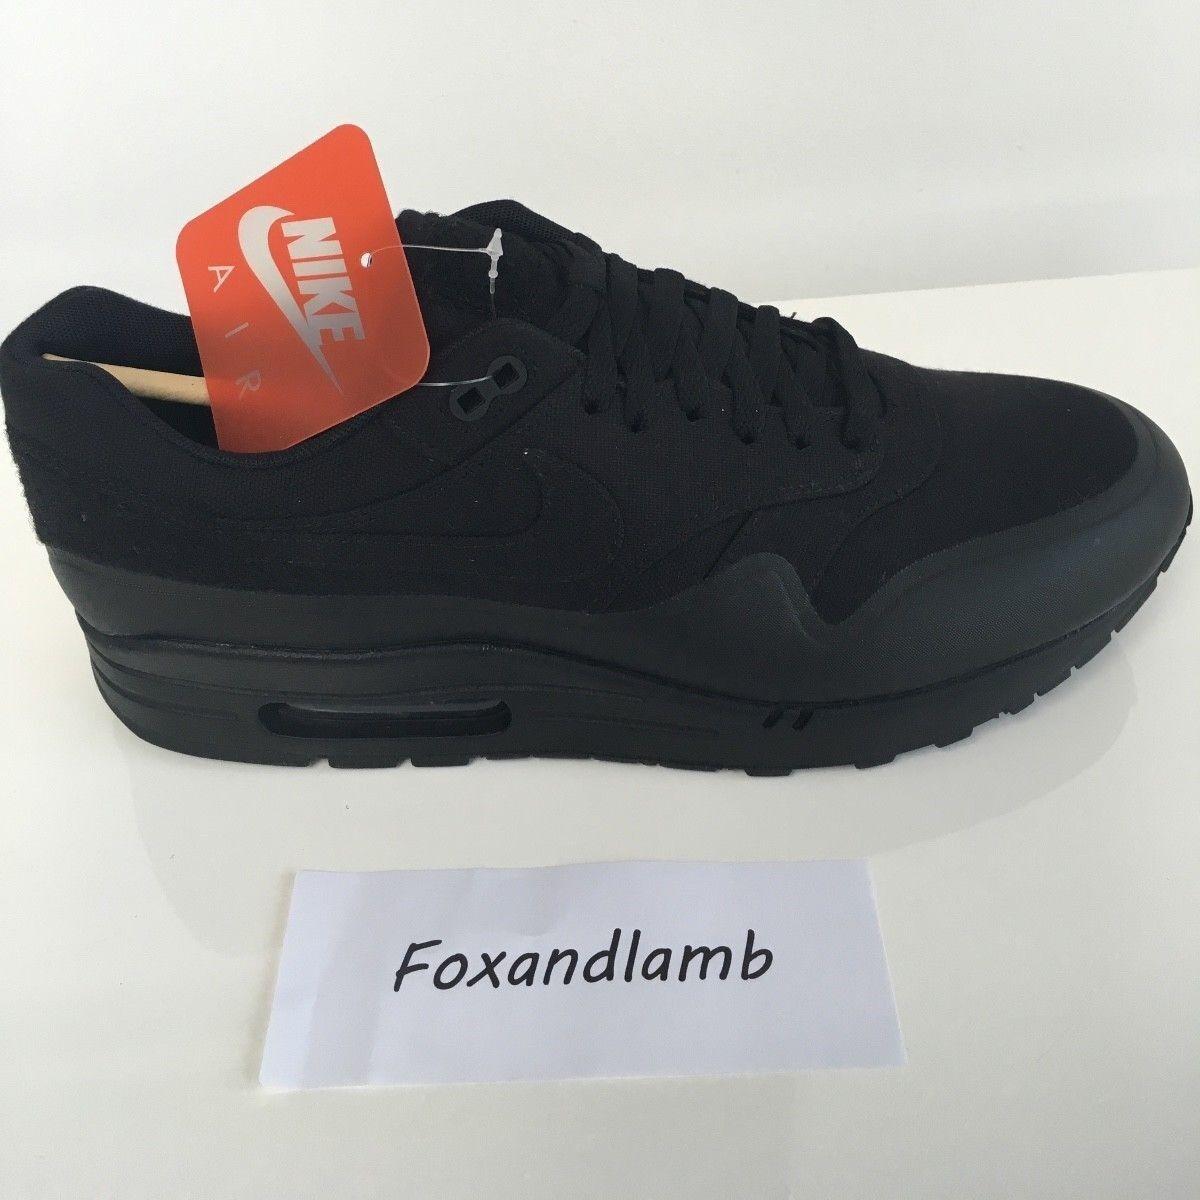 wholesale dealer 9ebd7 5c82e Nike Air Max 1 Patch V SP UK11 - Never Never Never Worn BNIB a9ed39. NIKE  AIR JORDAN ...